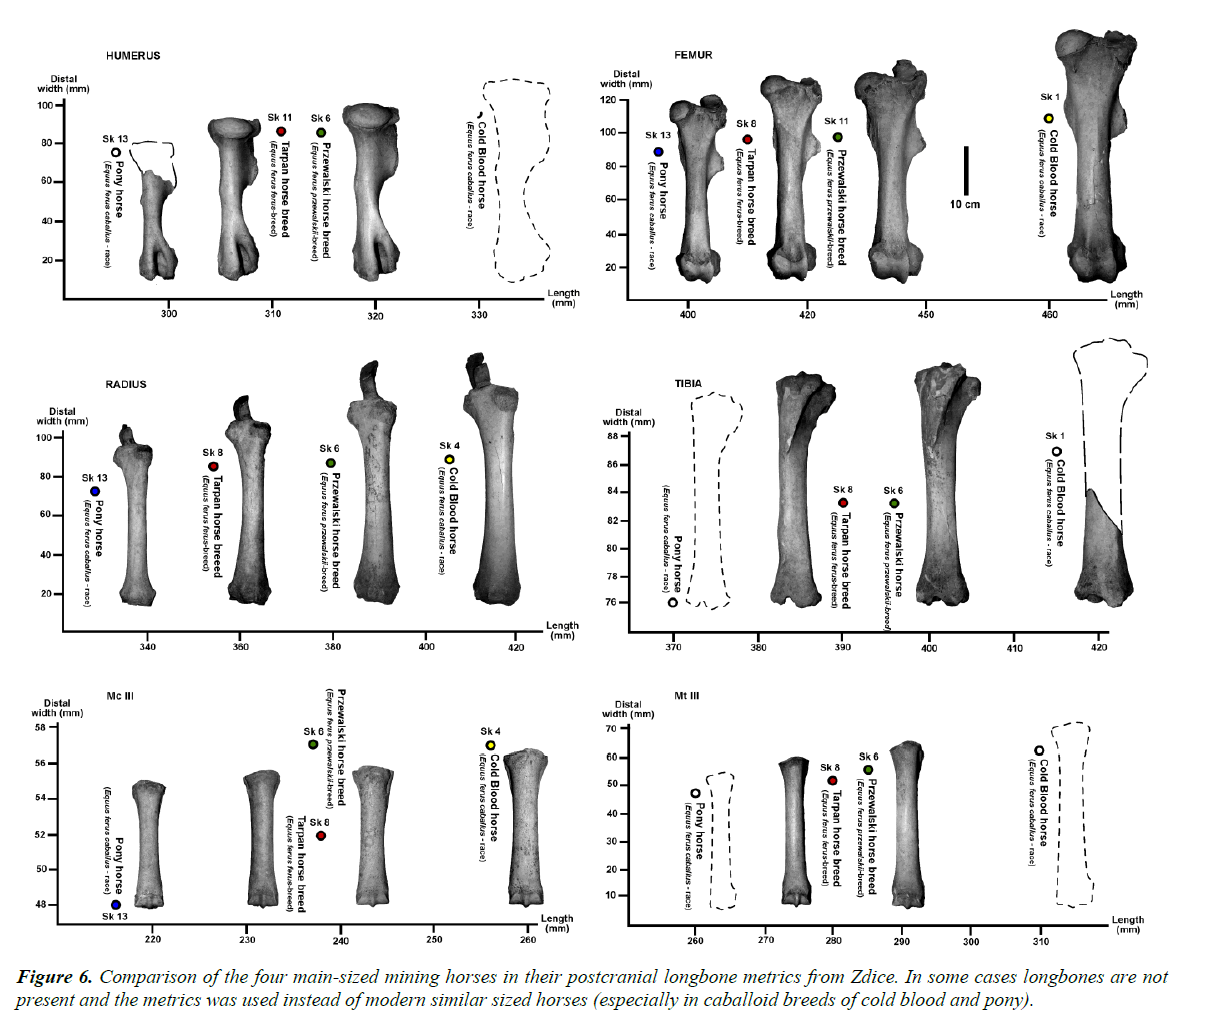 pathology-disease-biology-longbone-metrics